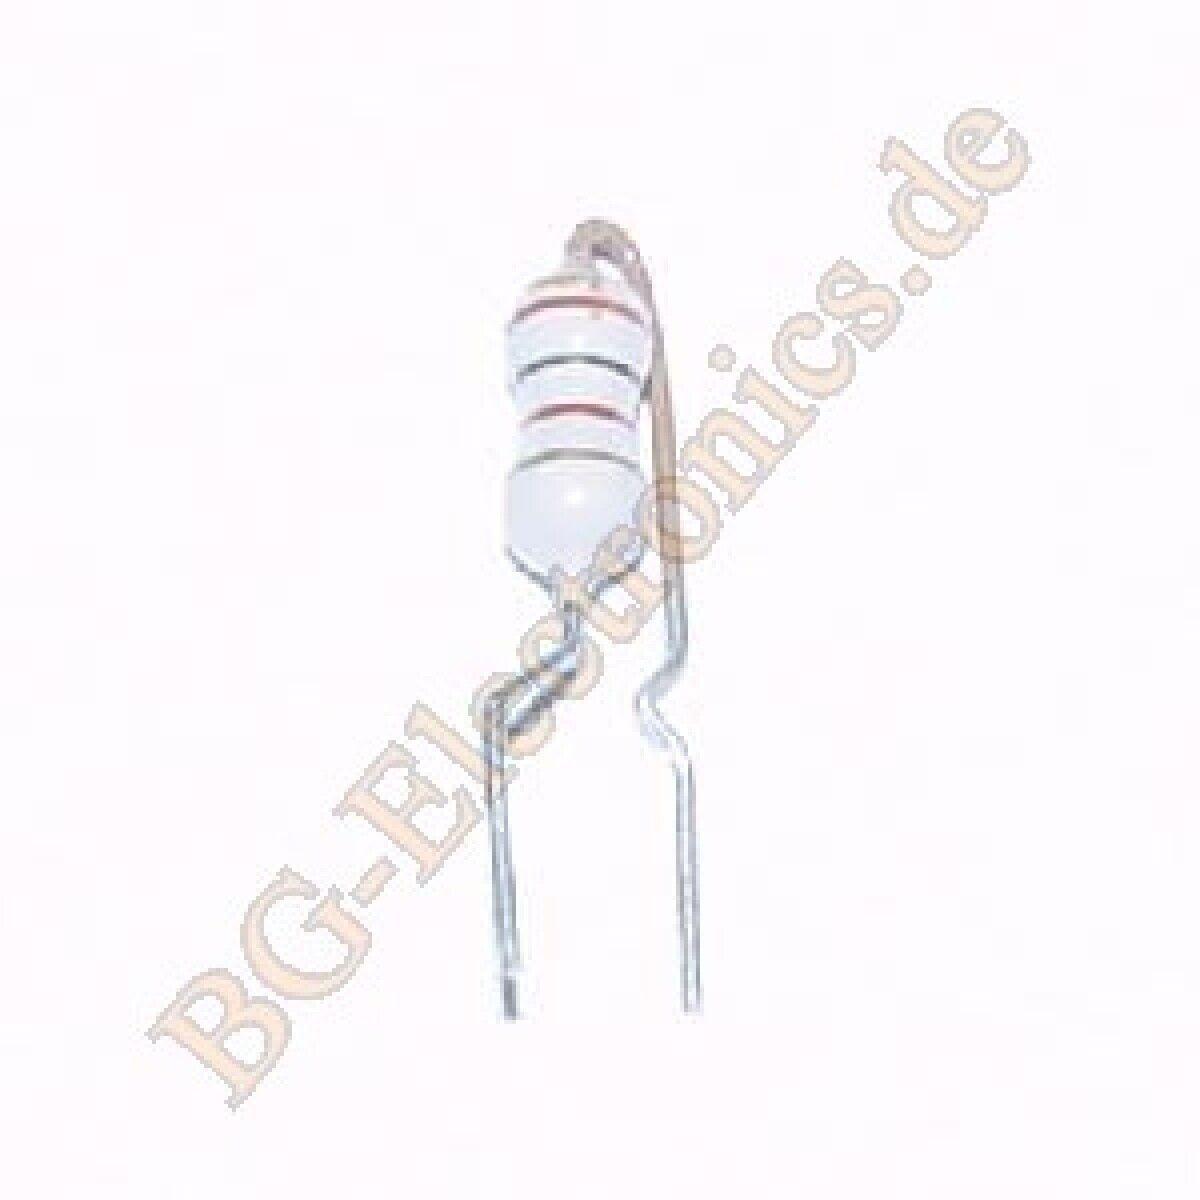 10 x DR 100µH stehend Drosselspule stehend SMCC-101J-31 Fastron  10pcs